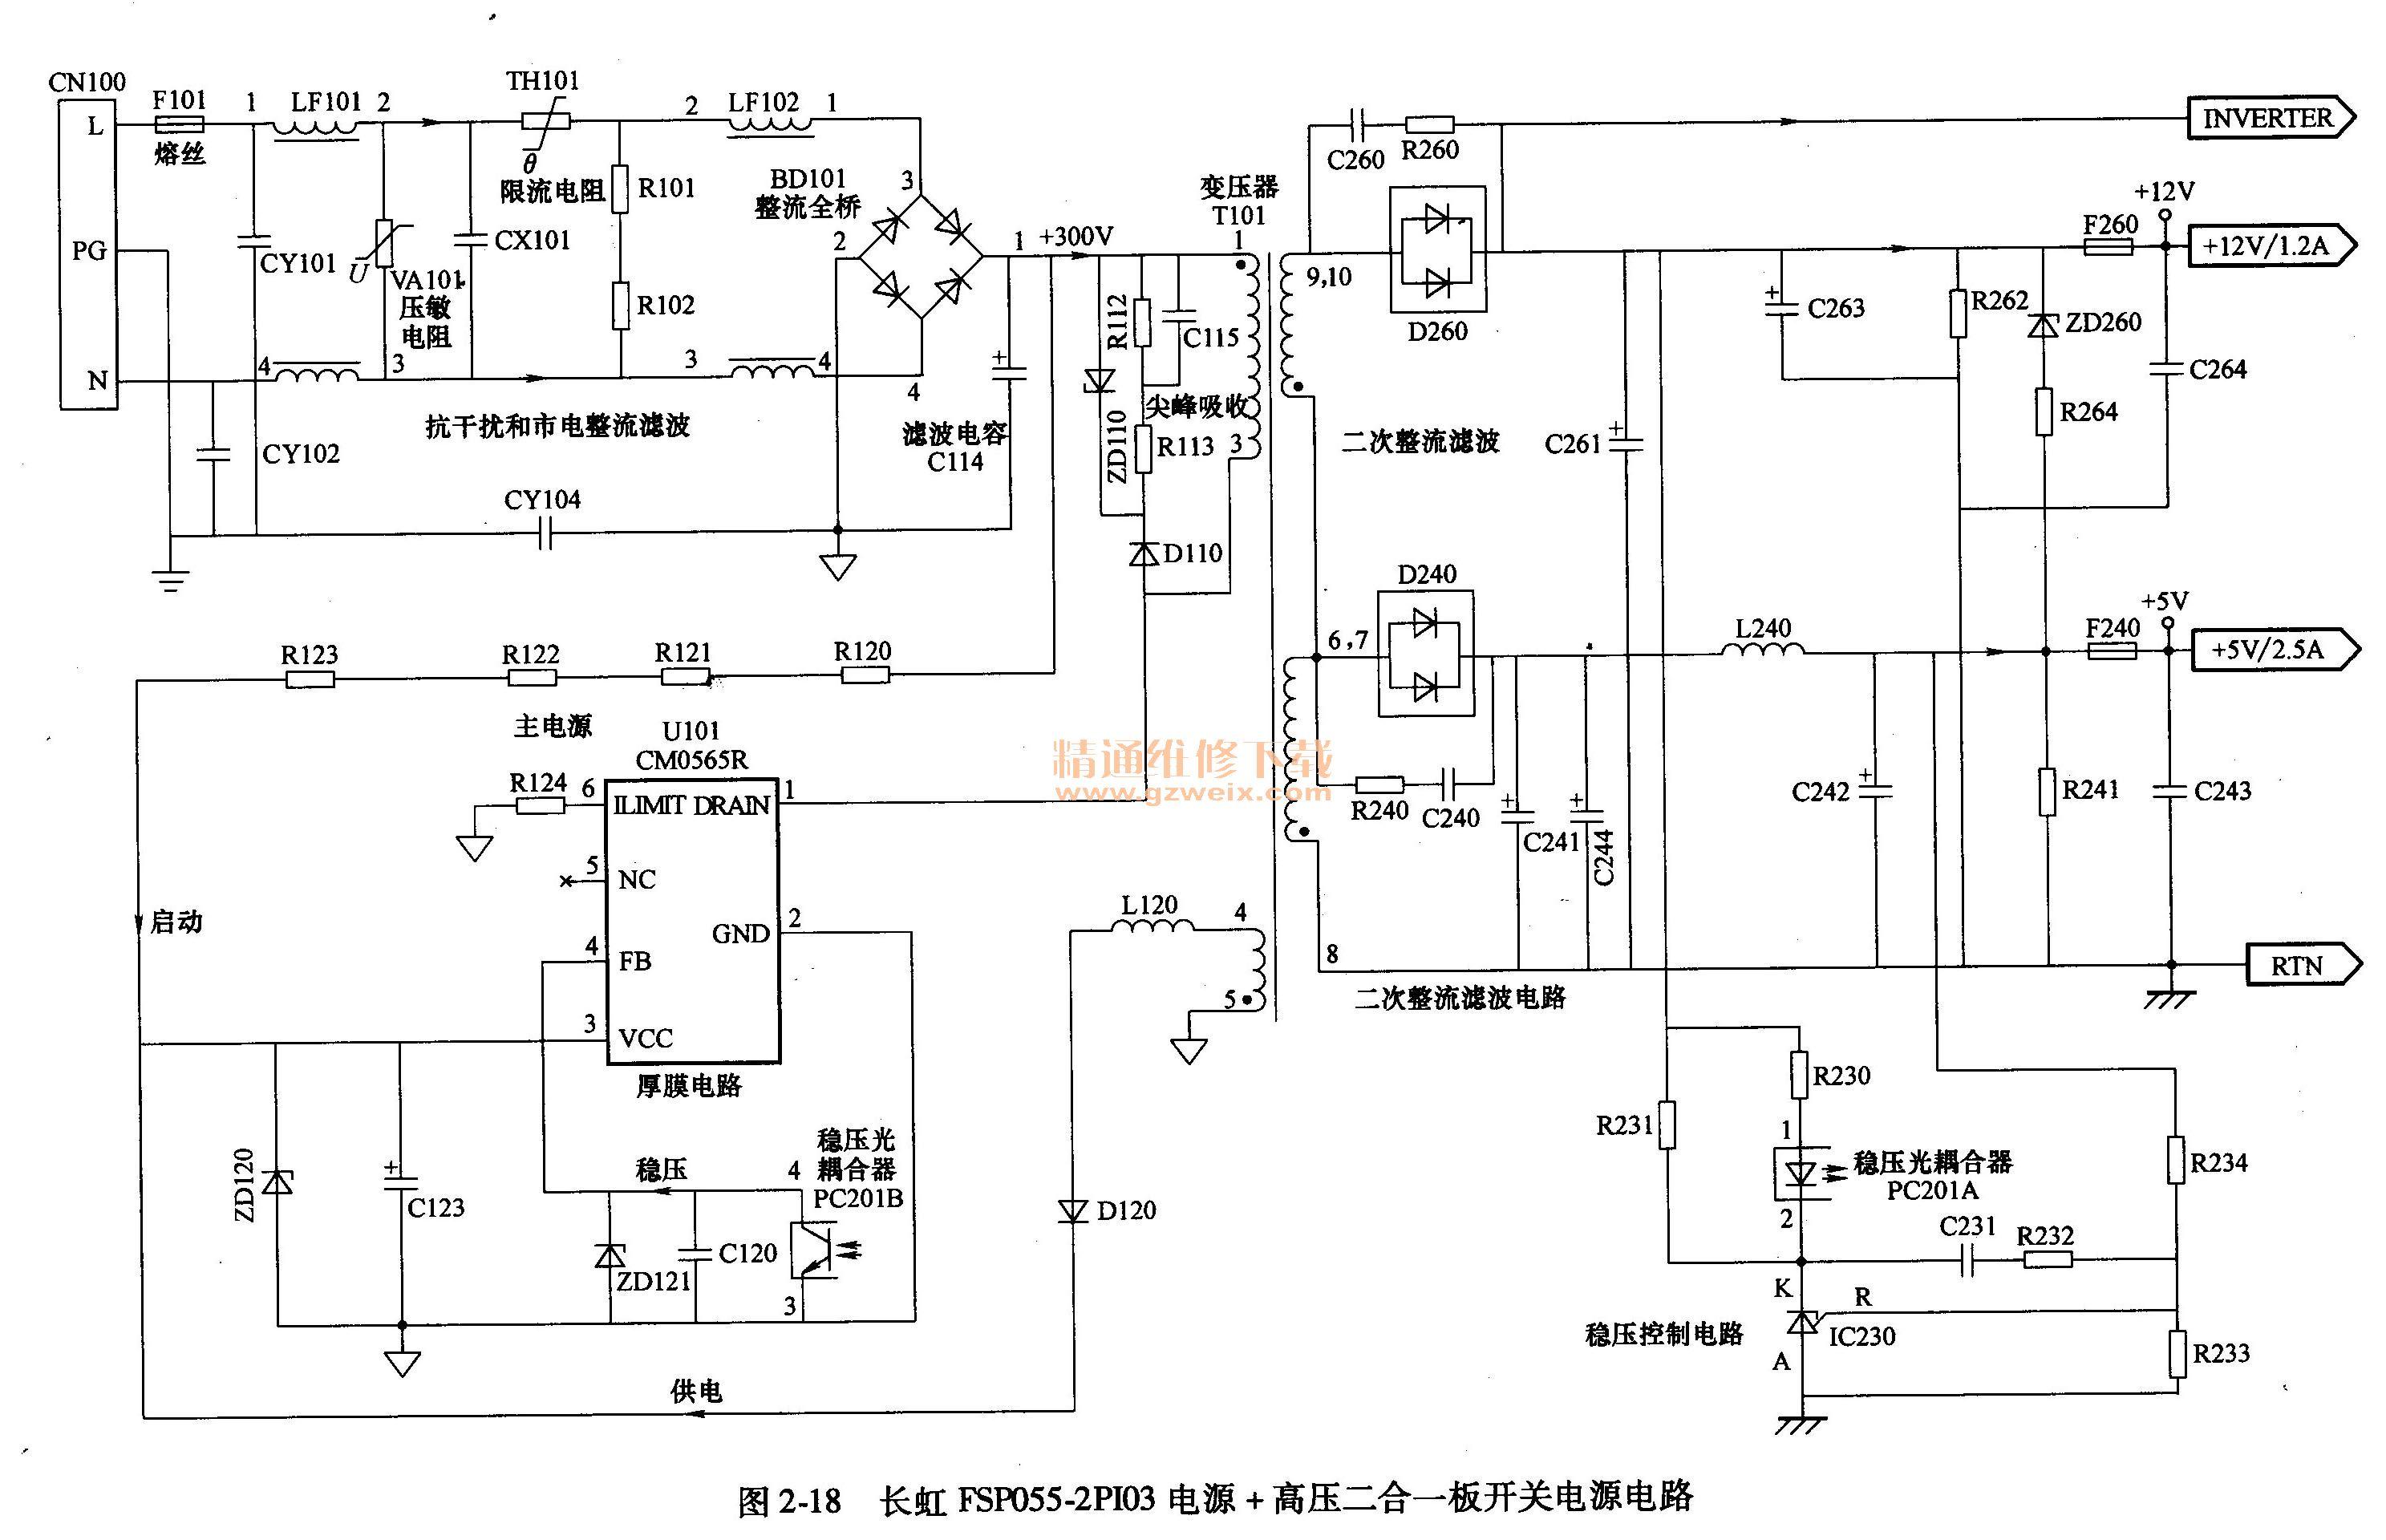 Cm0565r схема включения